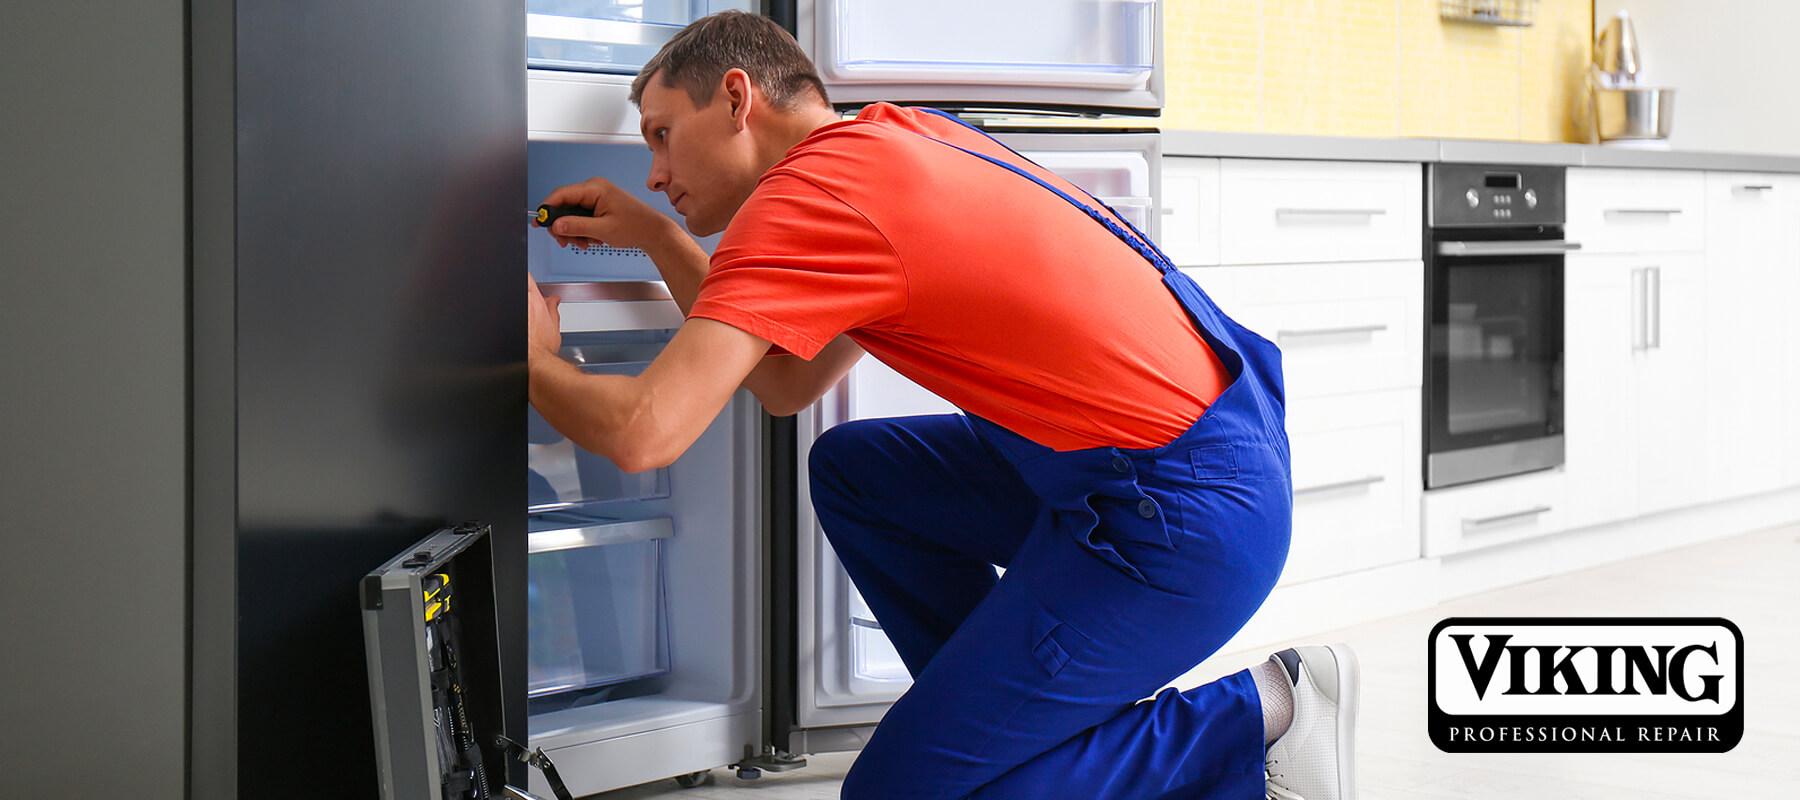 Authorized Viking Appliance Repair Service Huntington Beach | Professional Viking Repair